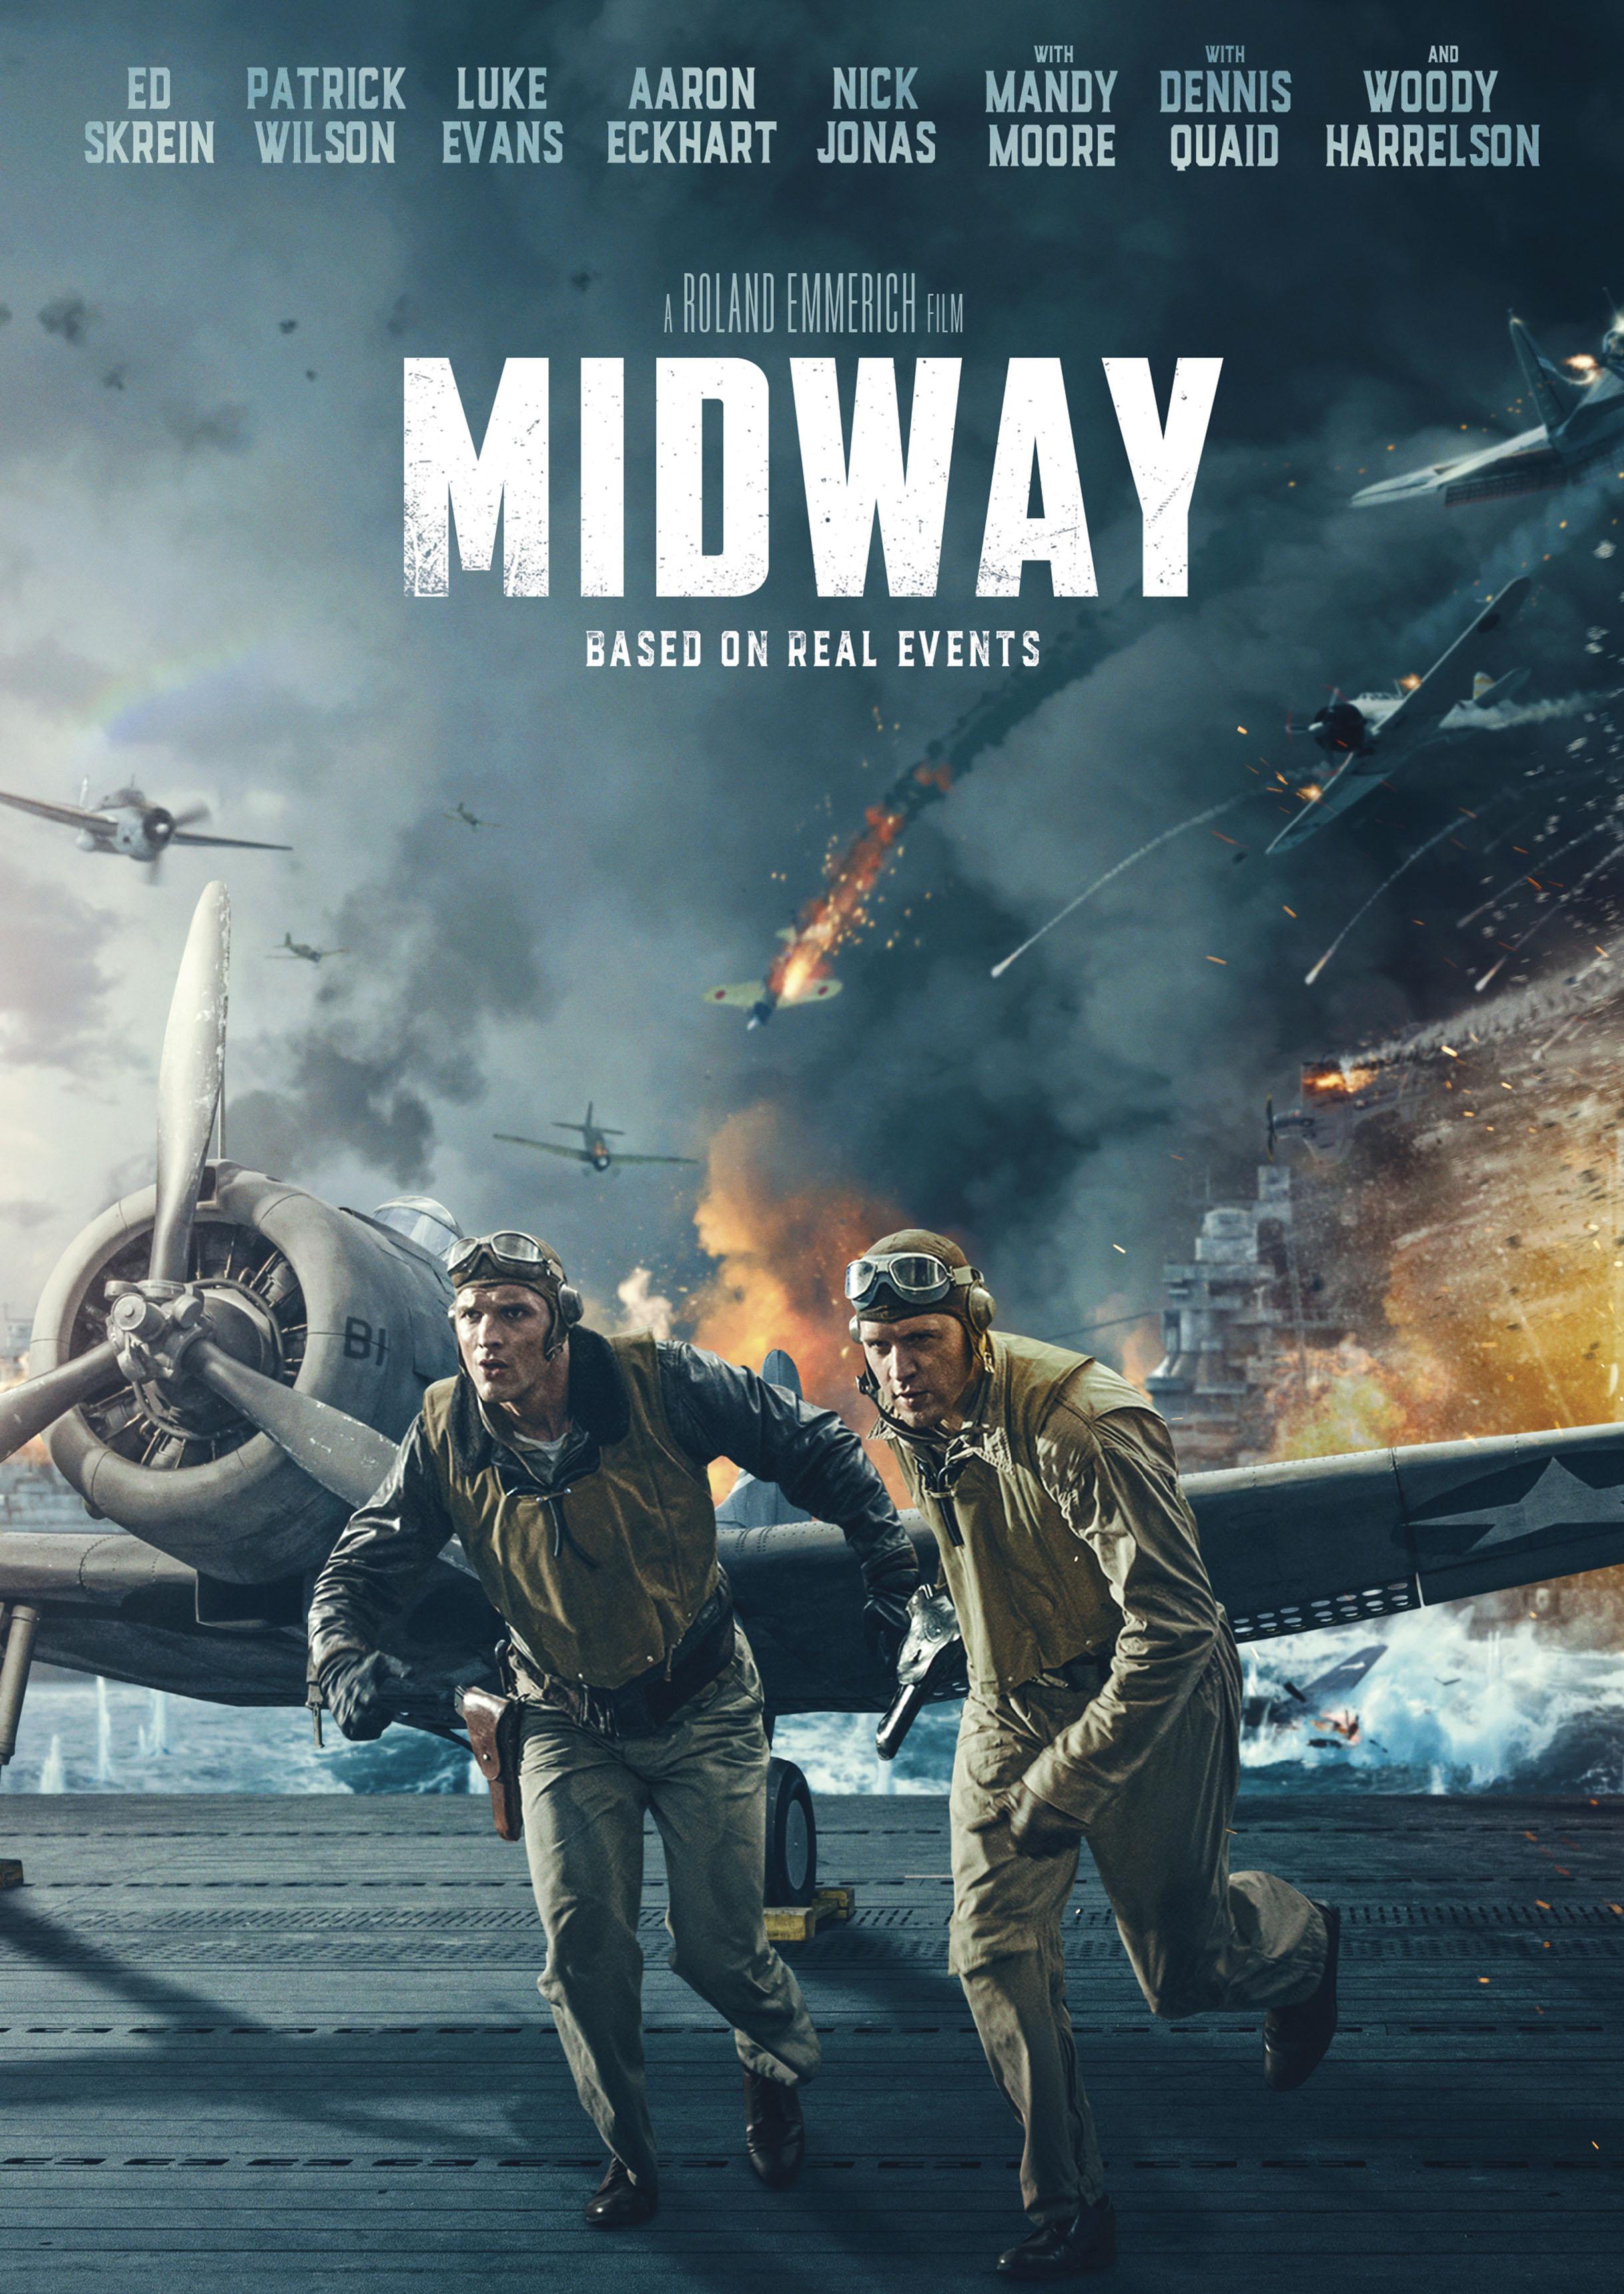 Midway Film 2019 Streaming : midway, streaming, Midway, [DVD], [2019]